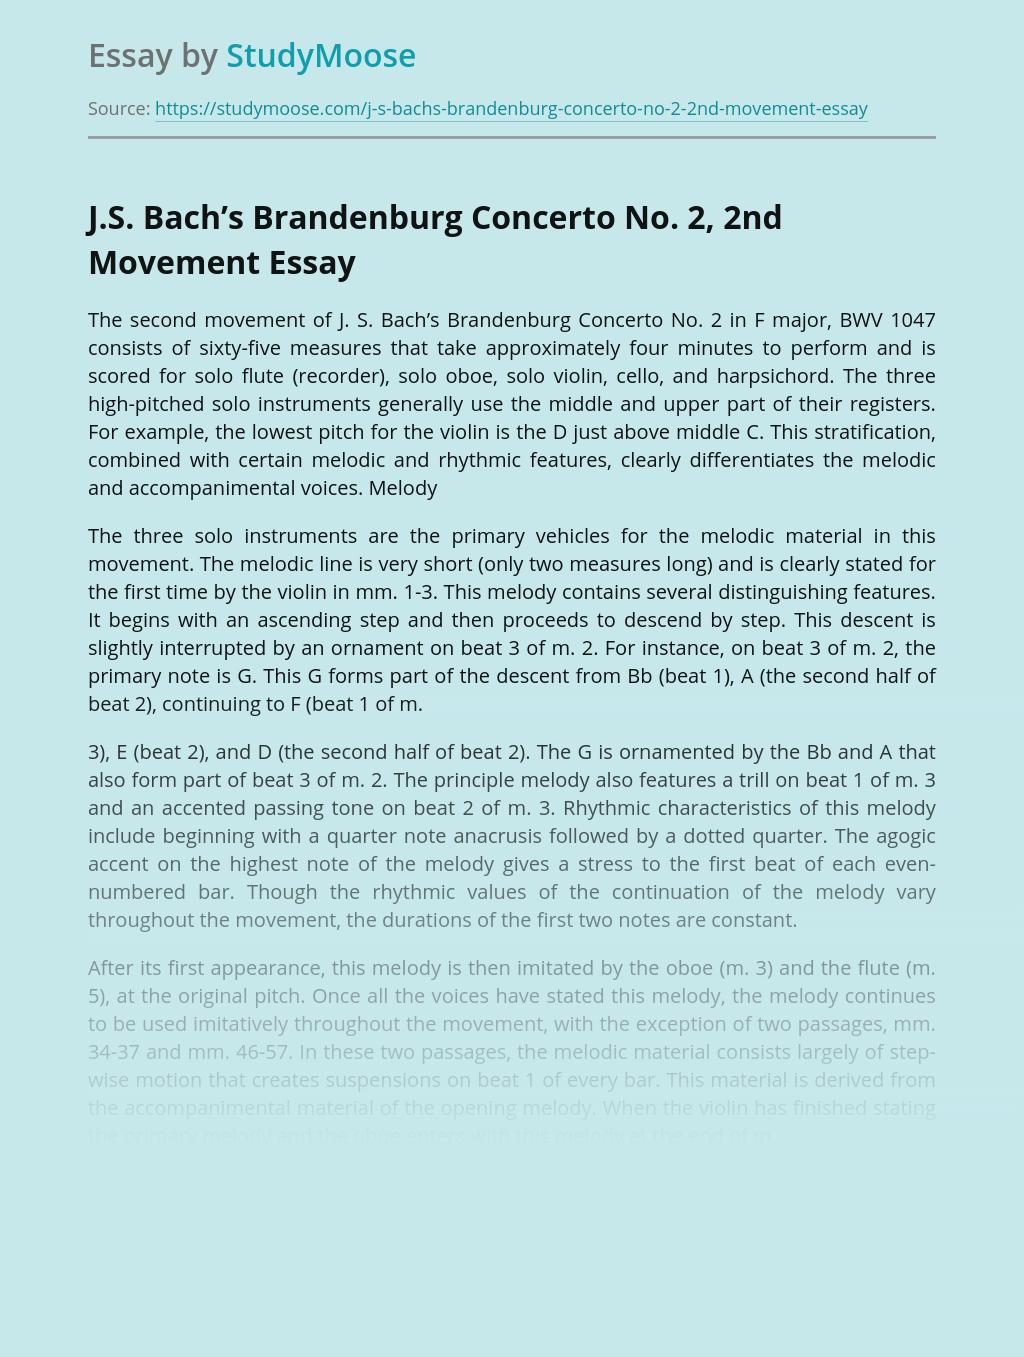 J.S. Bach's Brandenburg Concerto No. 2, 2nd Movement